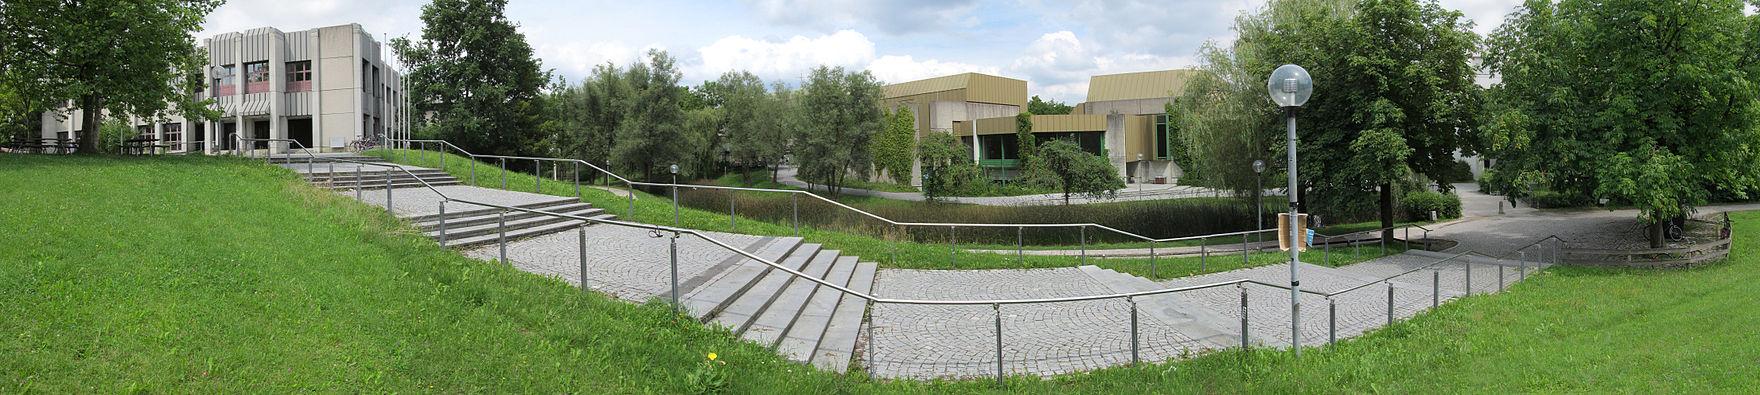 bibliothek augsburg uni